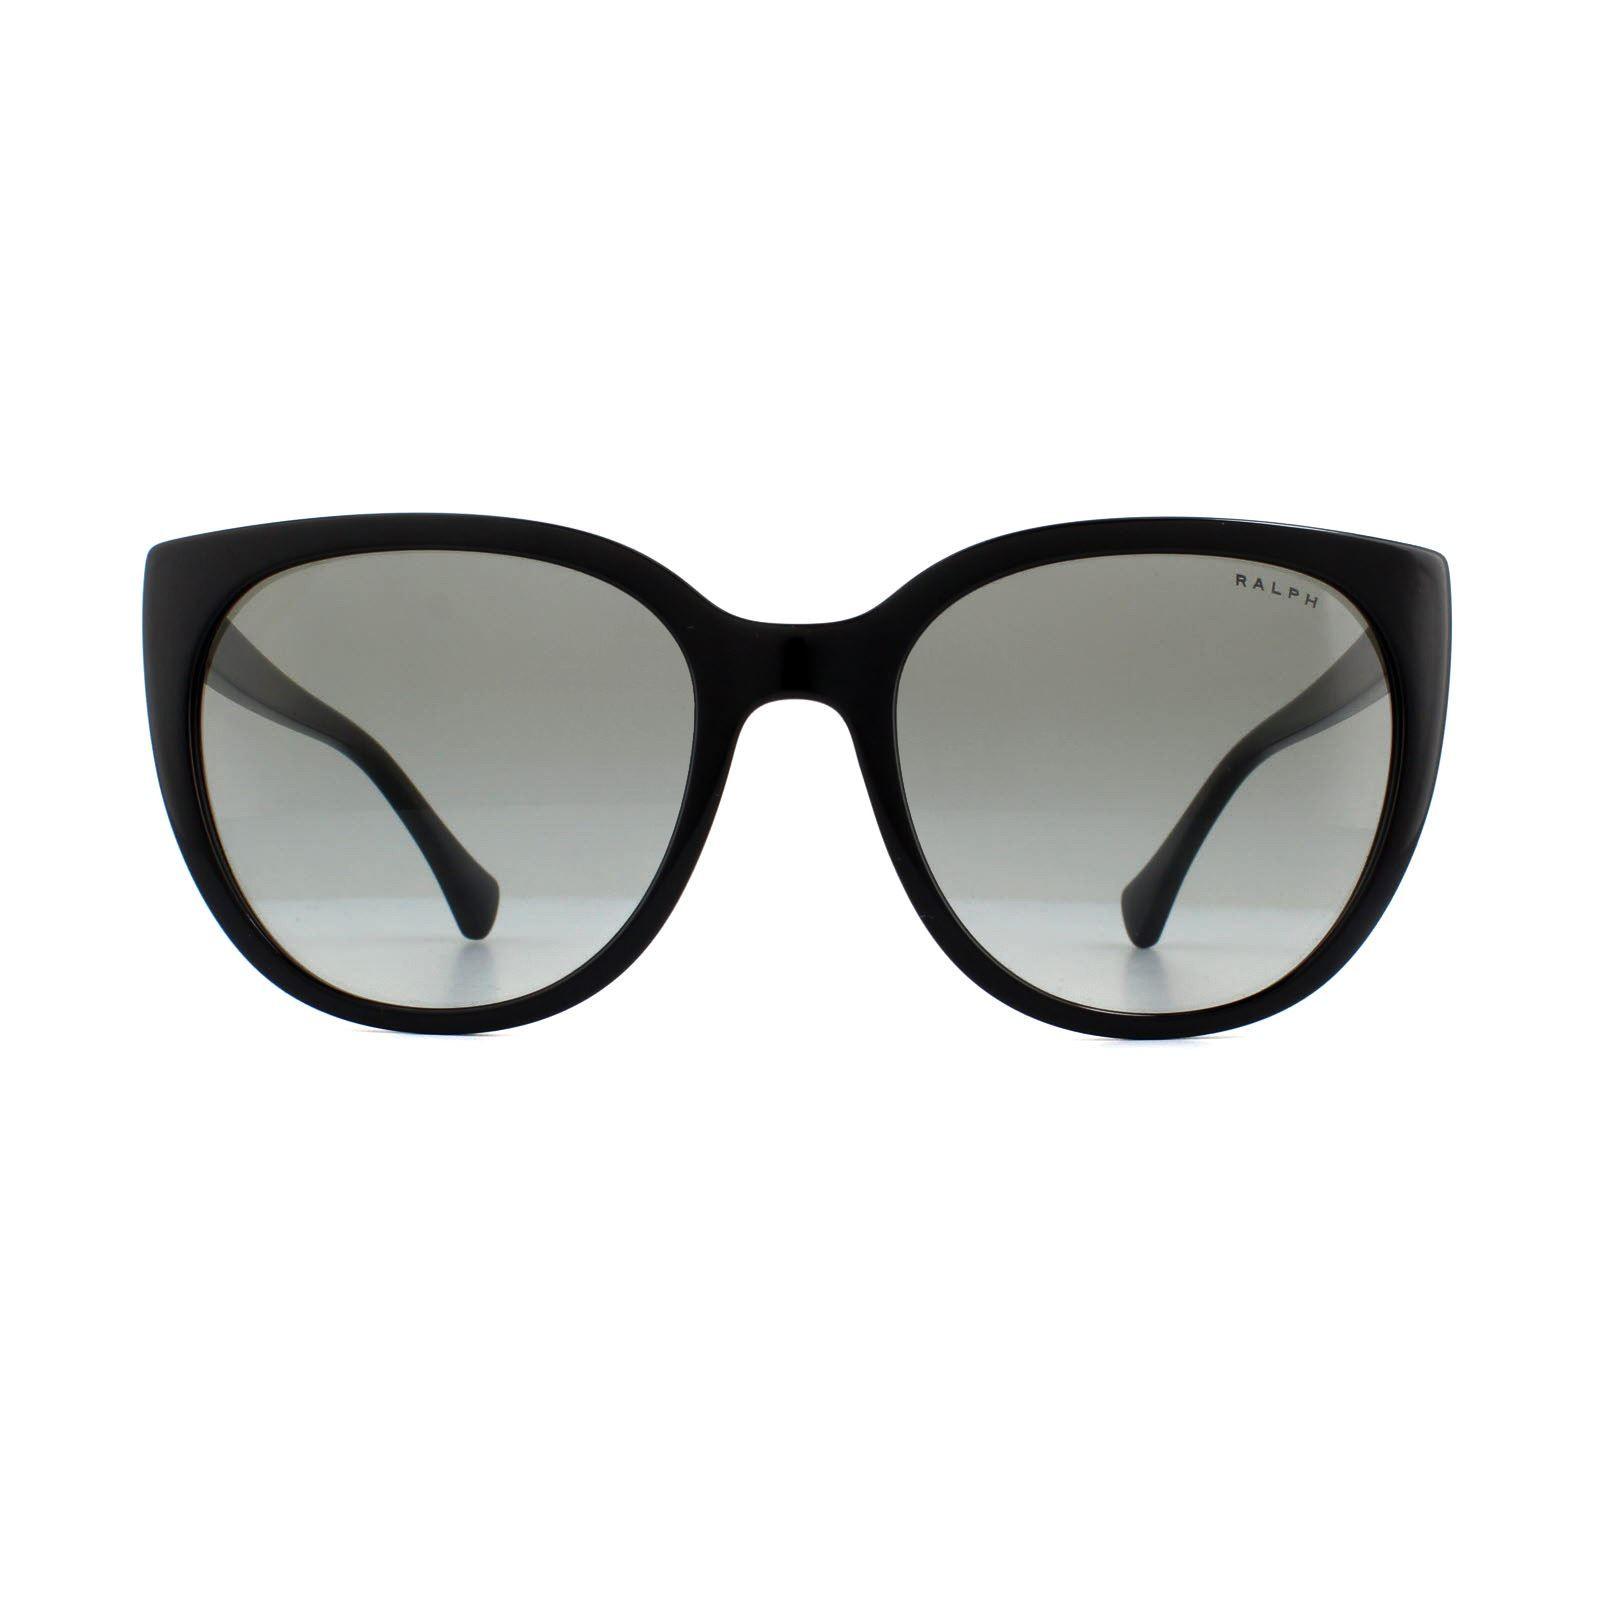 Ralph by Ralph Lauren Sunglasses RA5249 500111 Black Black